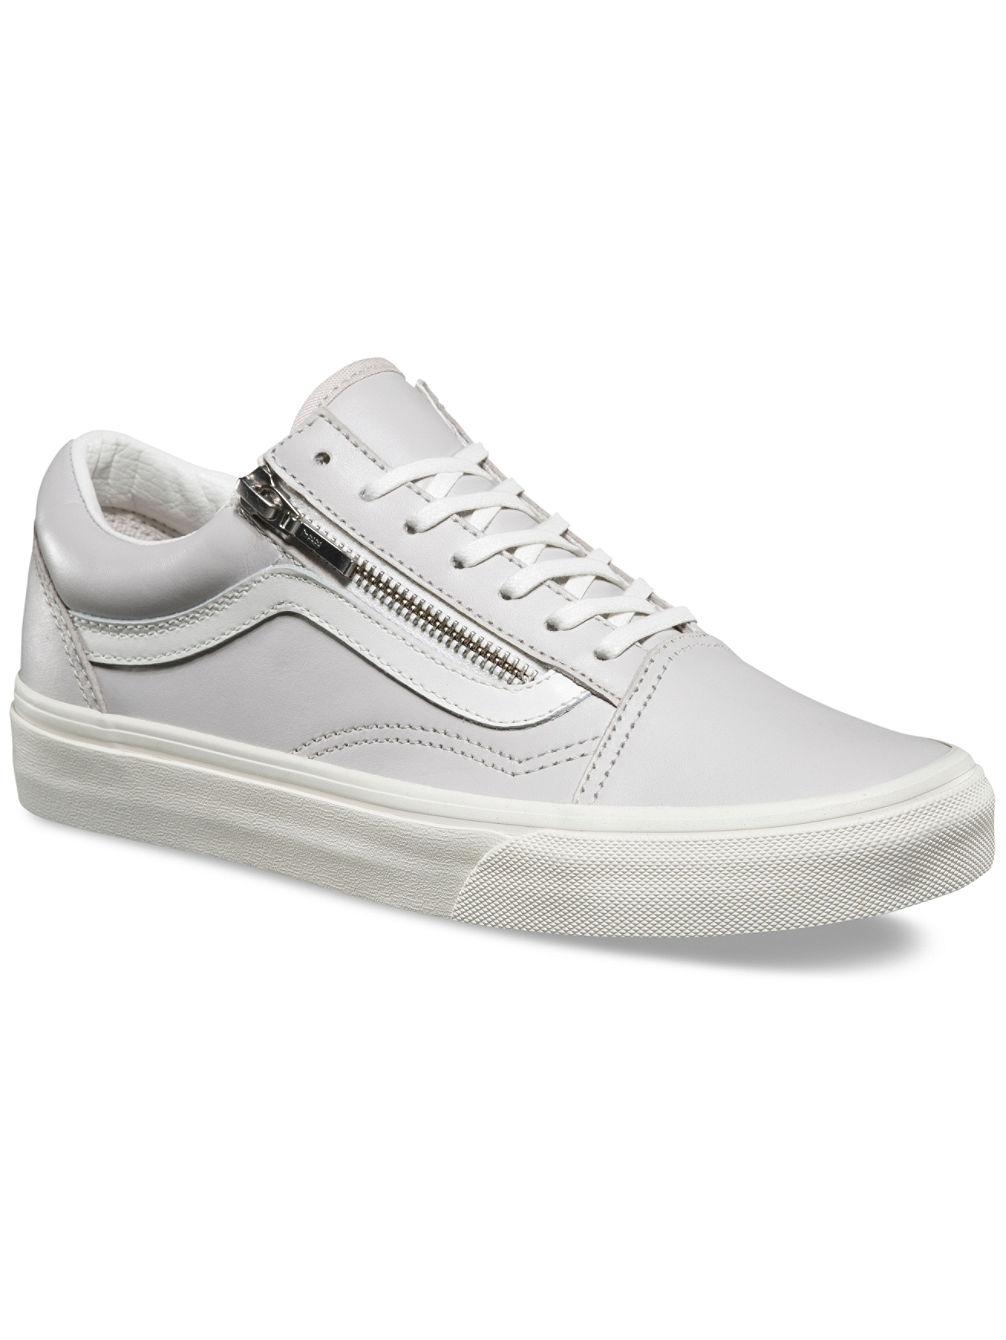 e127f77404 Buy Vans Leather Old Skool Zip Sneakers online at Blue Tomato